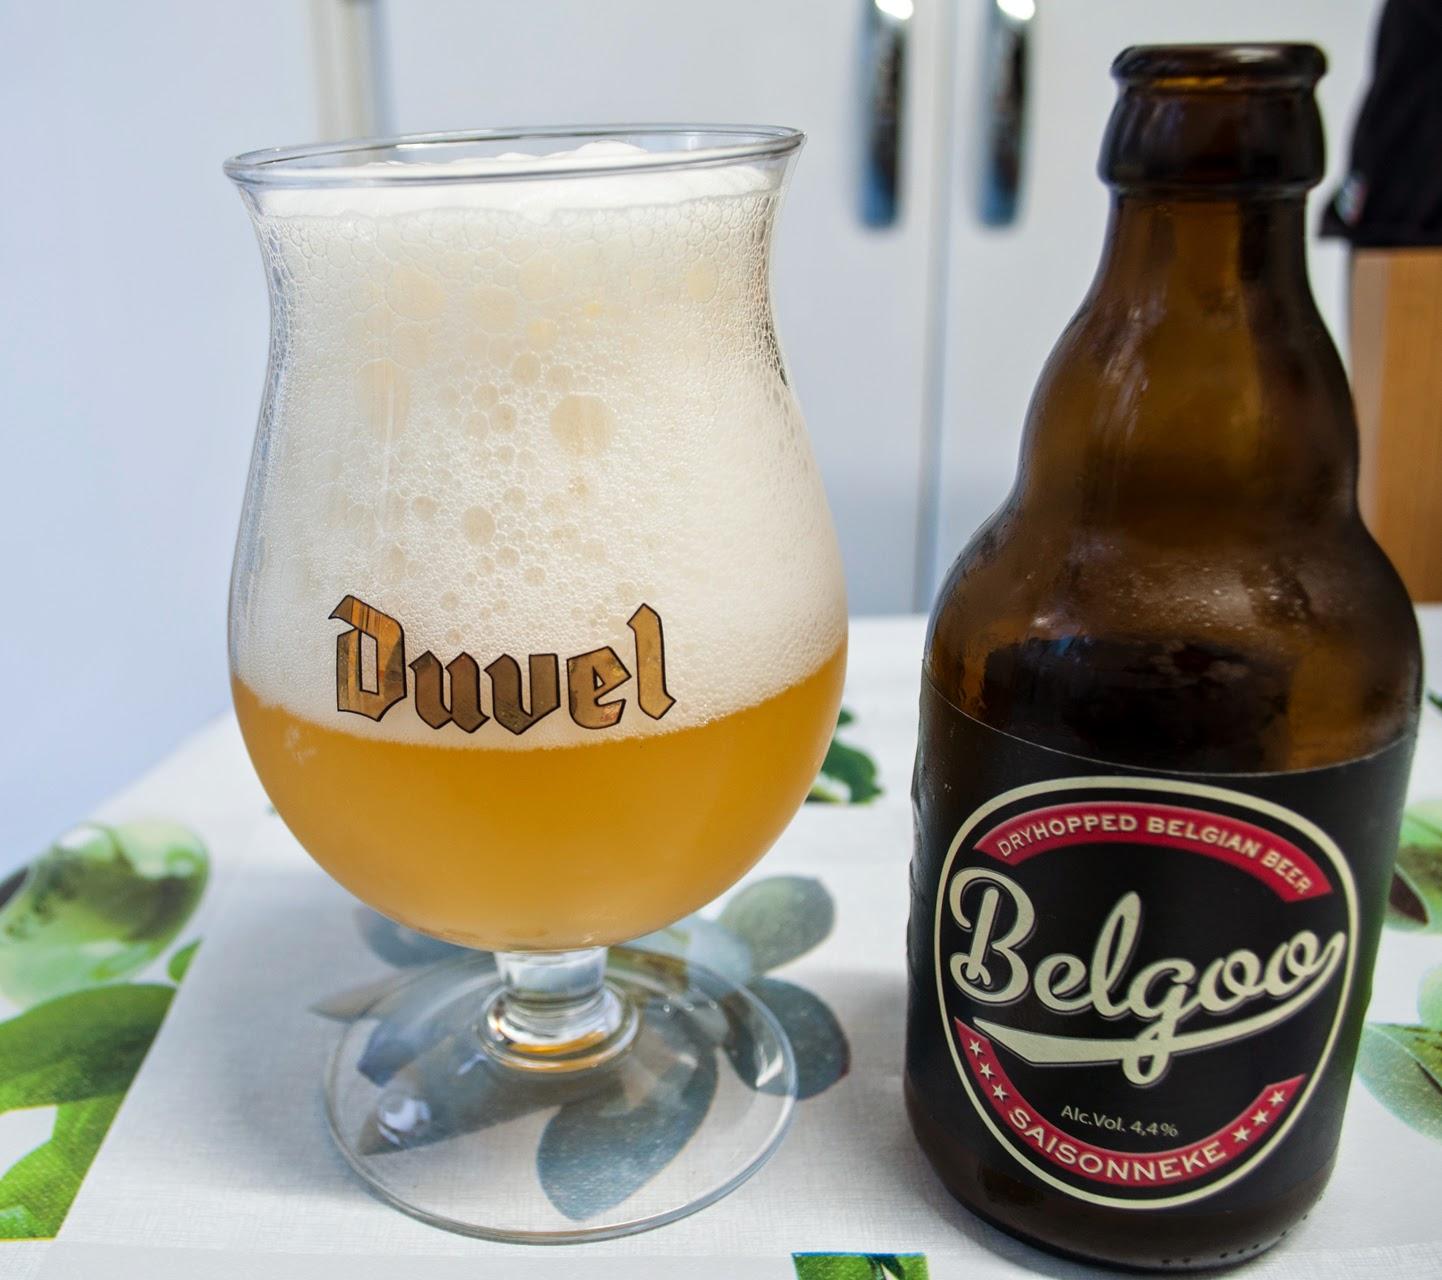 Belgoo Saisonneke